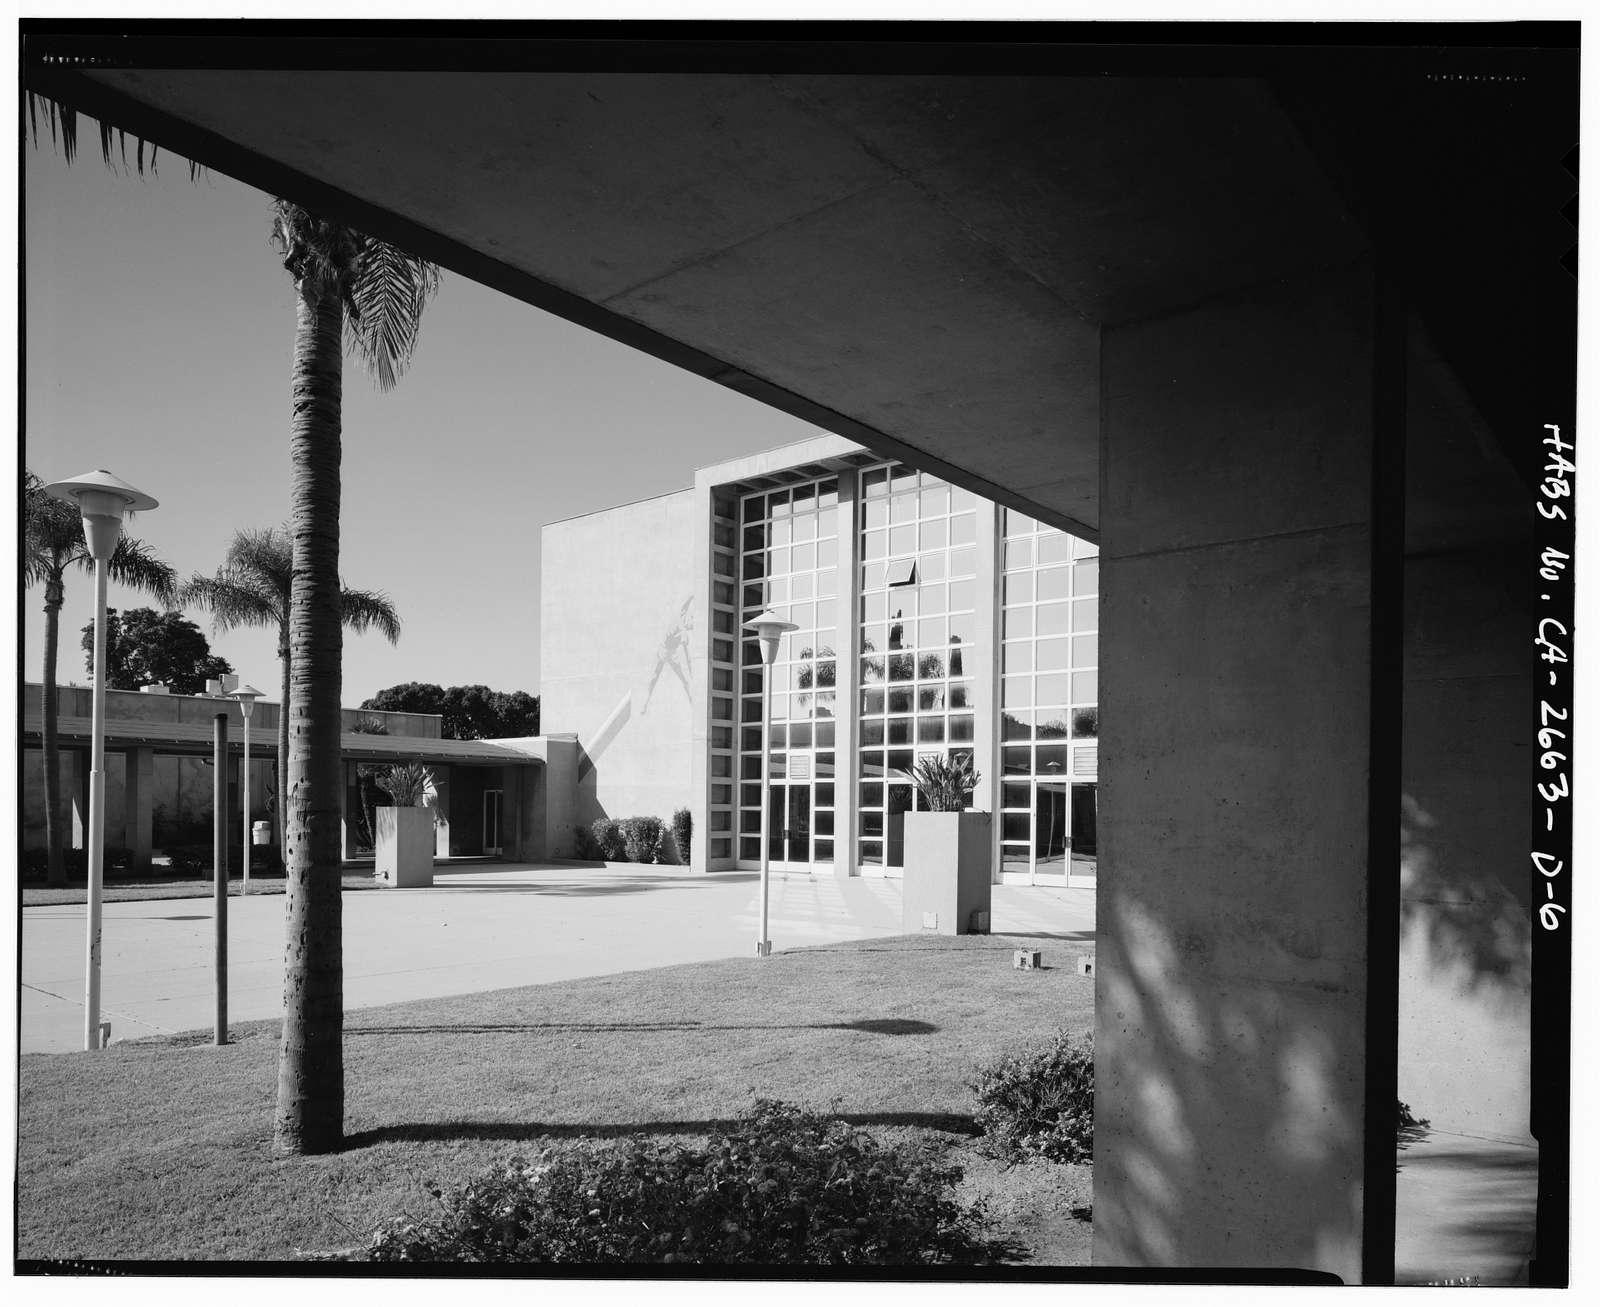 Roosevelt Base, Auditorium-Gymnasium, West Virginia Street between Richardson & Reeves Avenues, Long Beach, Los Angeles County, CA